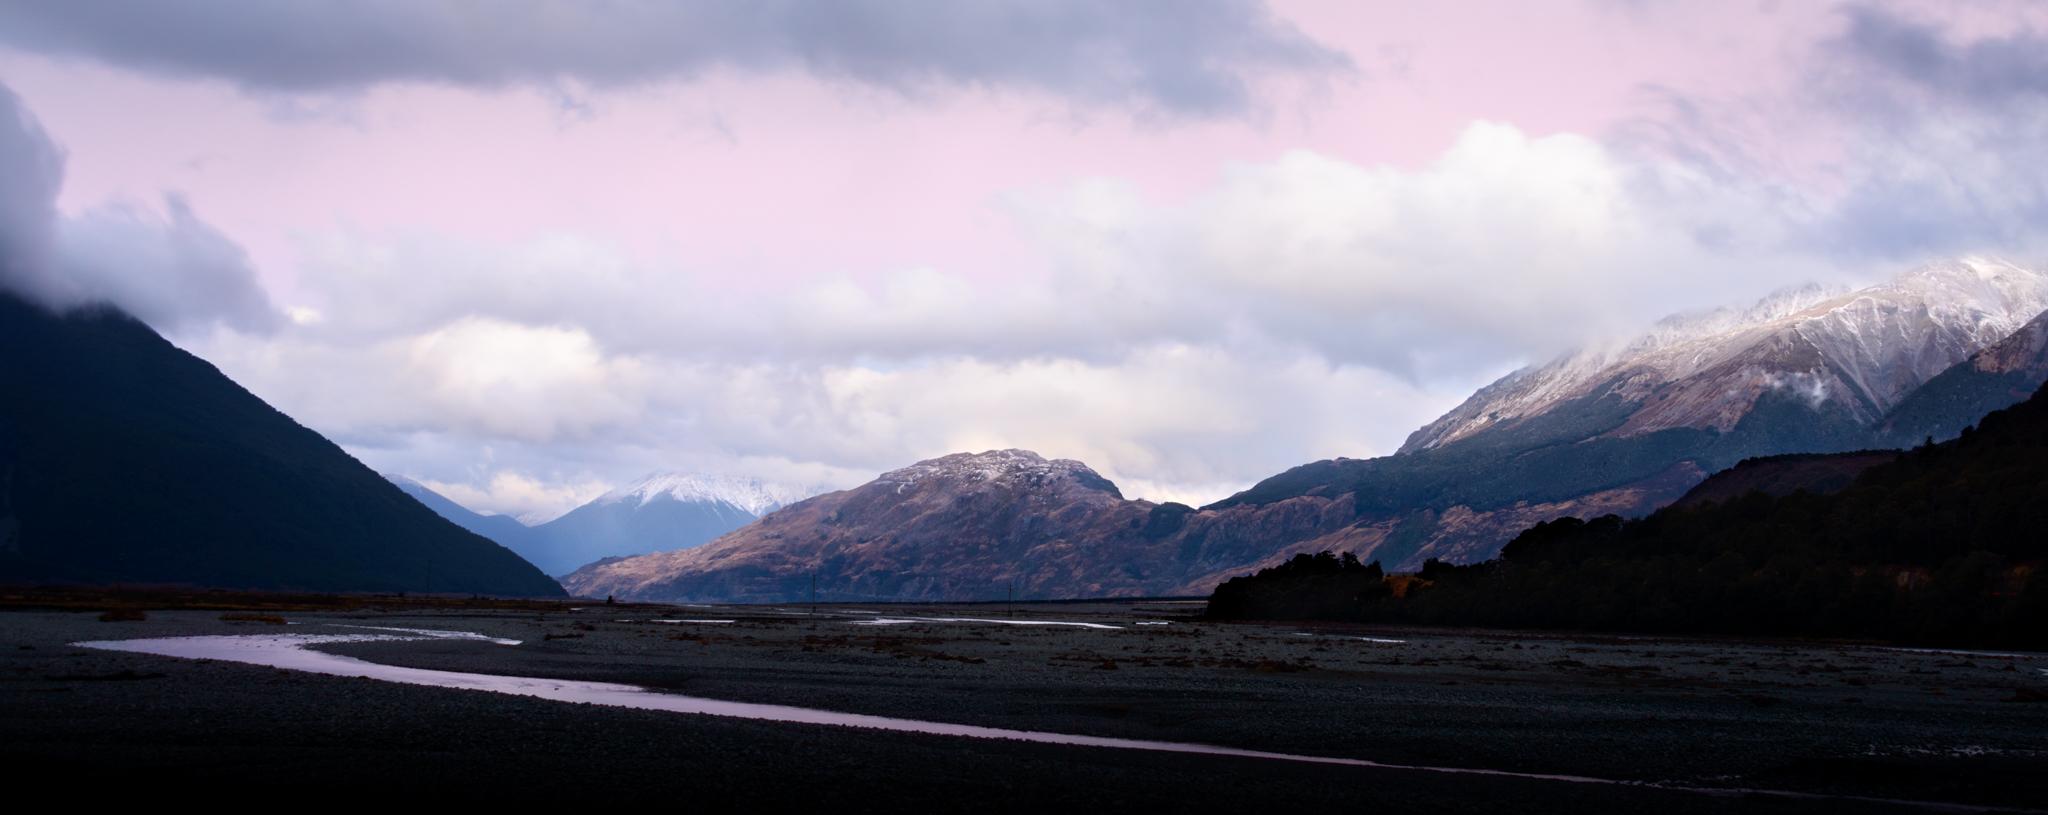 """Horrible Pink""  Waimakariri River and Mt Horrible, Arthurs Pass National Park, New Zealand  D800, ISO100, f8, 4sec, 36mm, Lee Little Stopper ND Filter"